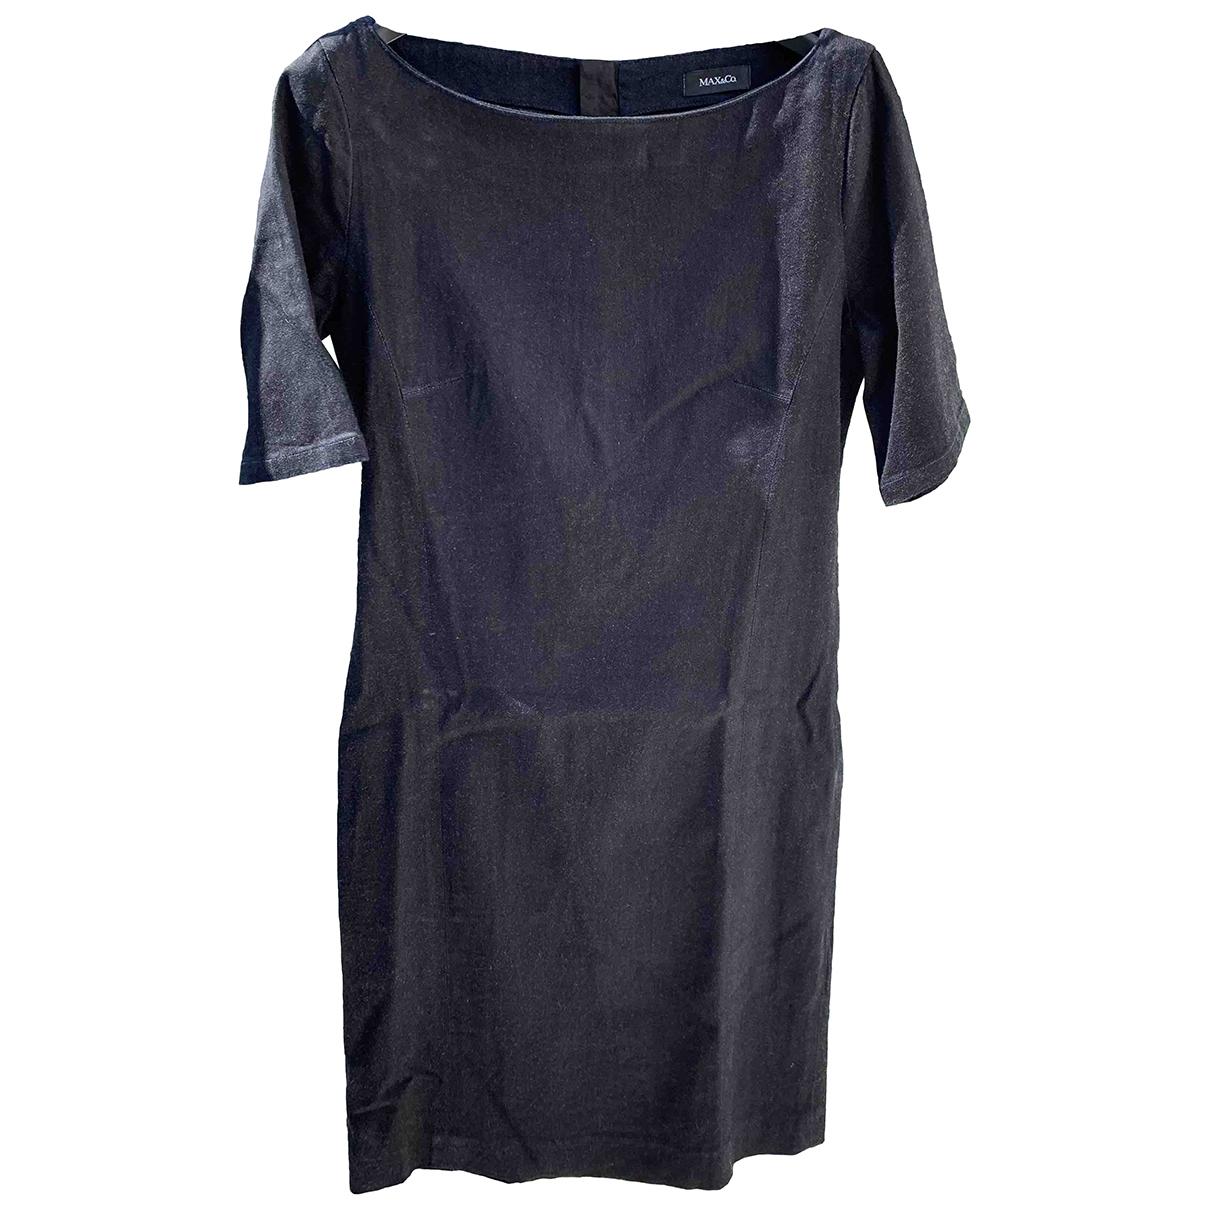 Max & Co \N Blue Cotton - elasthane dress for Women 42 IT